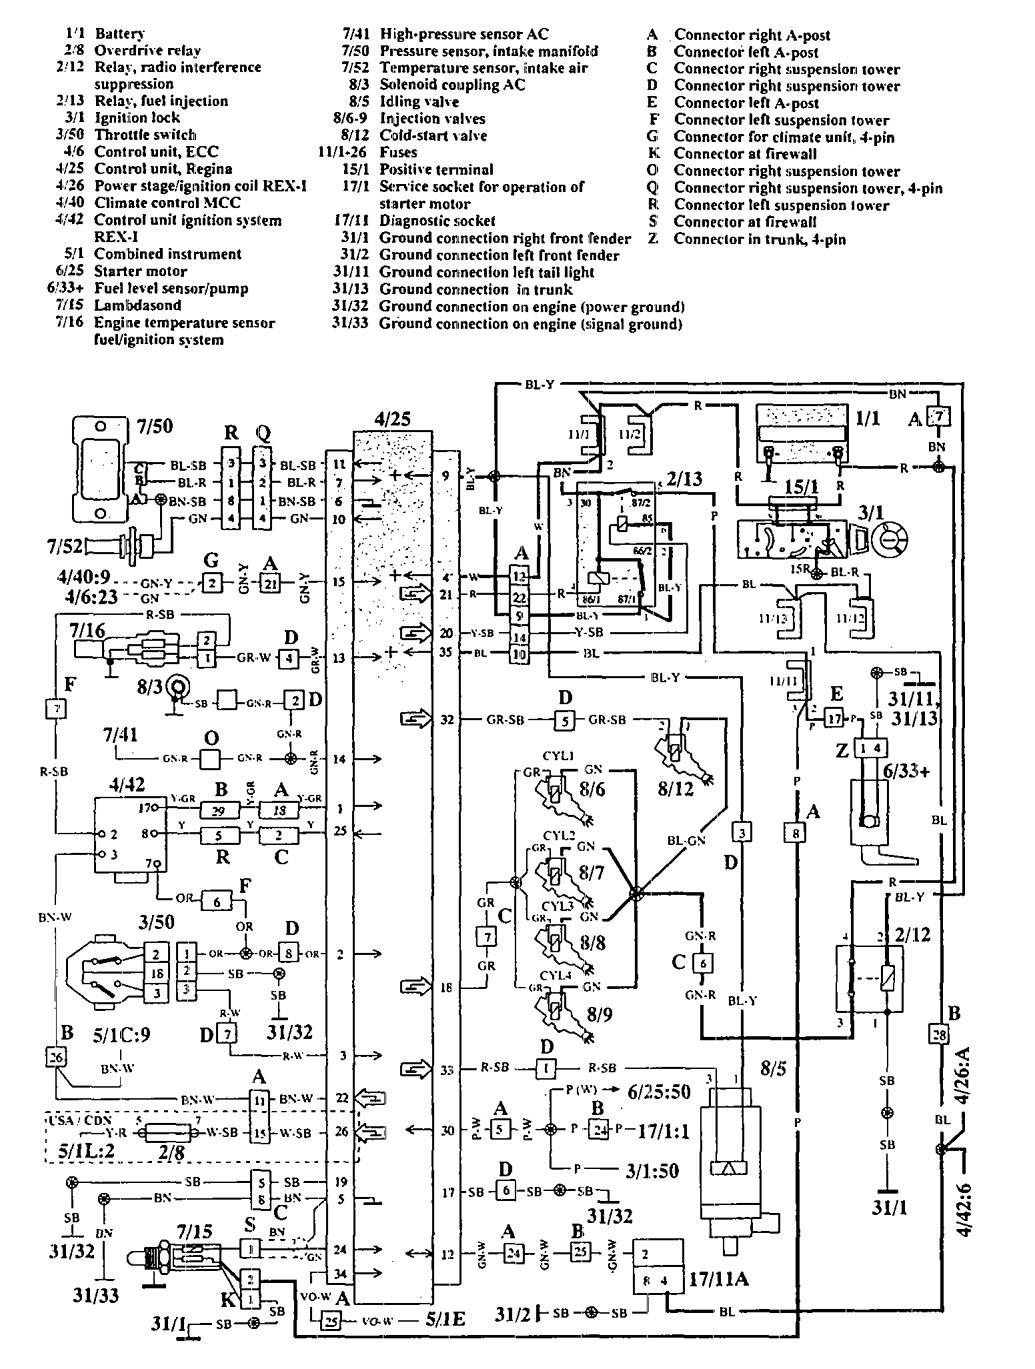 1992 Volvo 940 Radio Wiring | Wiring Diagram